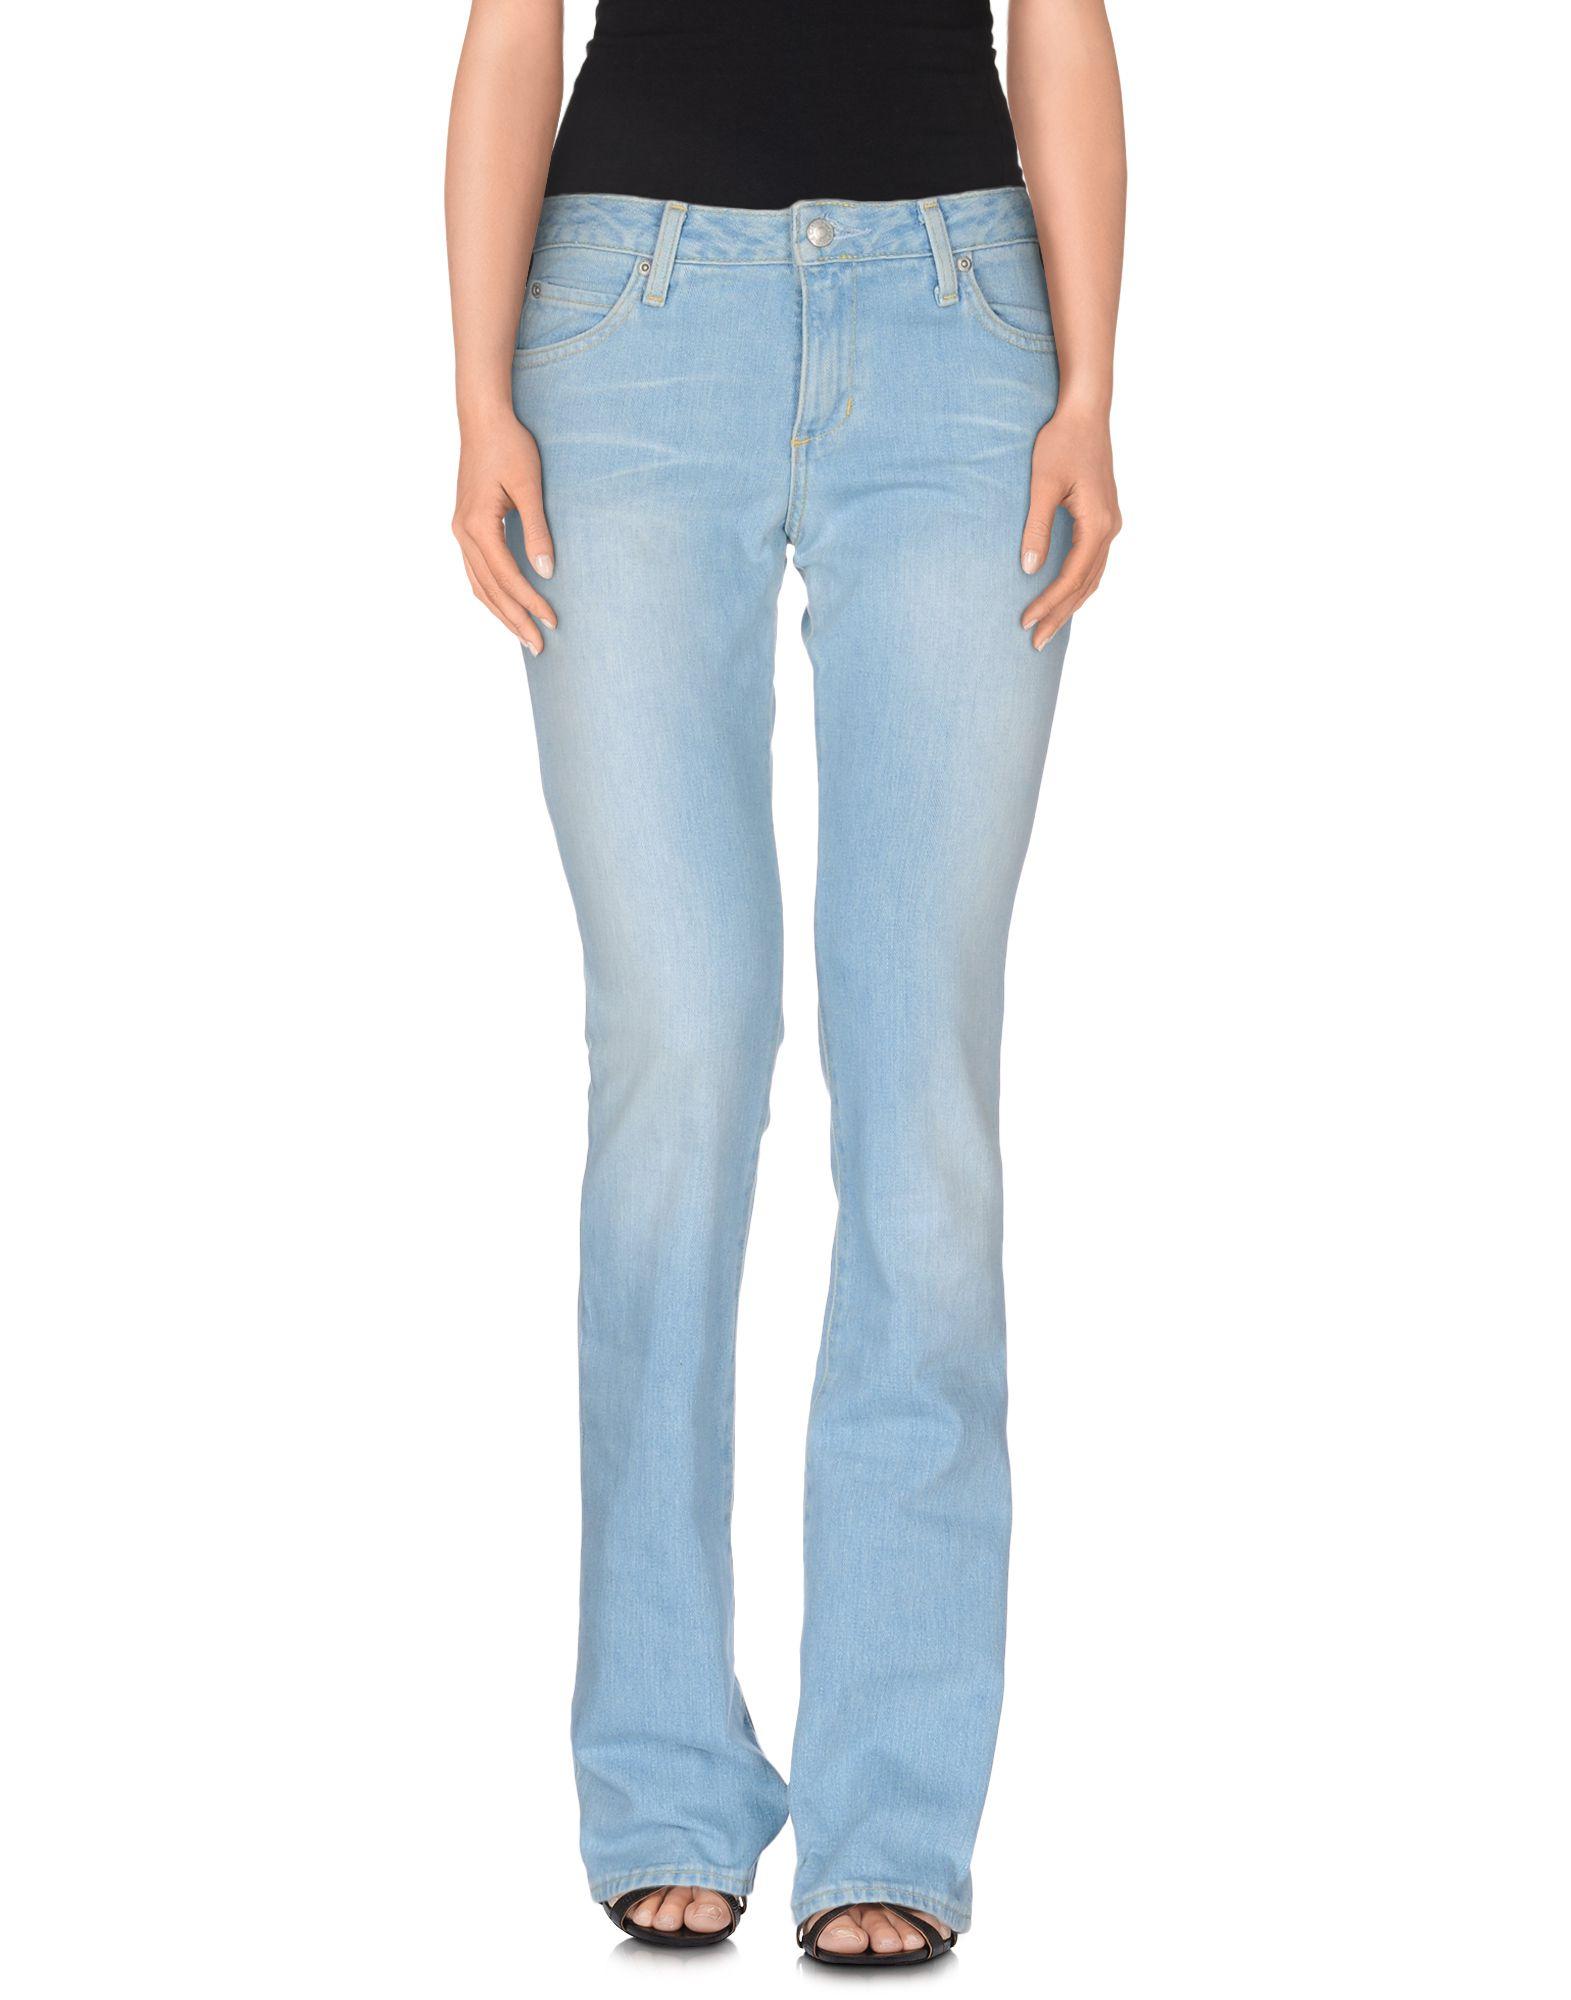 PAPERDENIM & CLOTH Jeans